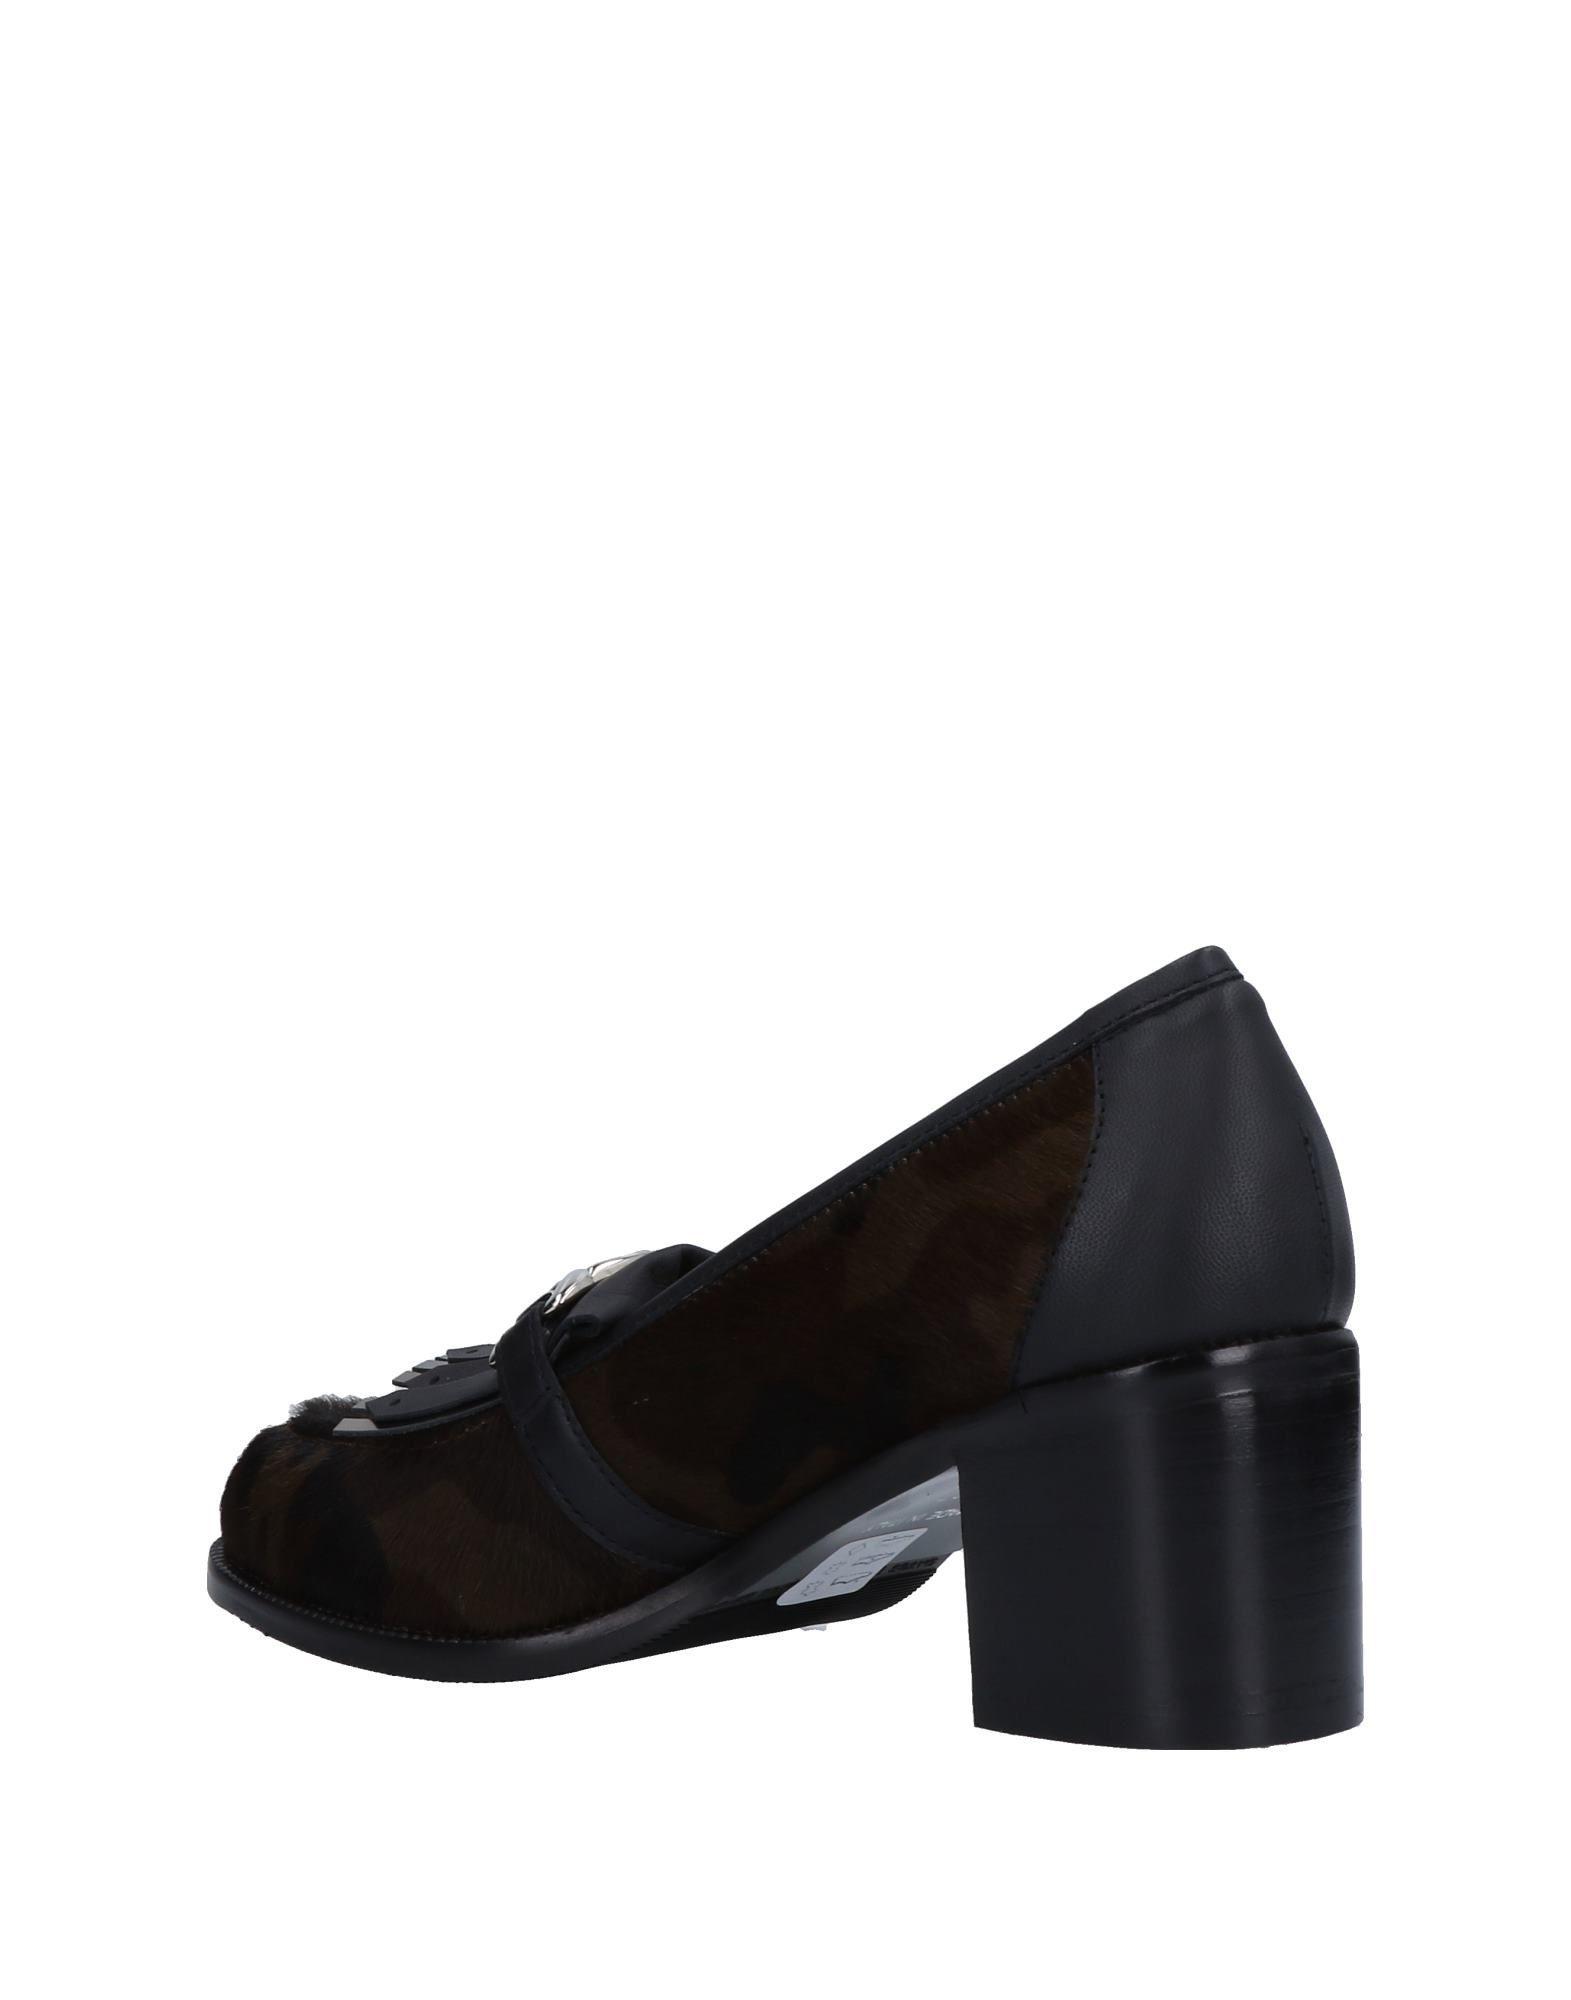 Bruglia Dark Brown Leather Court Shoe Heels